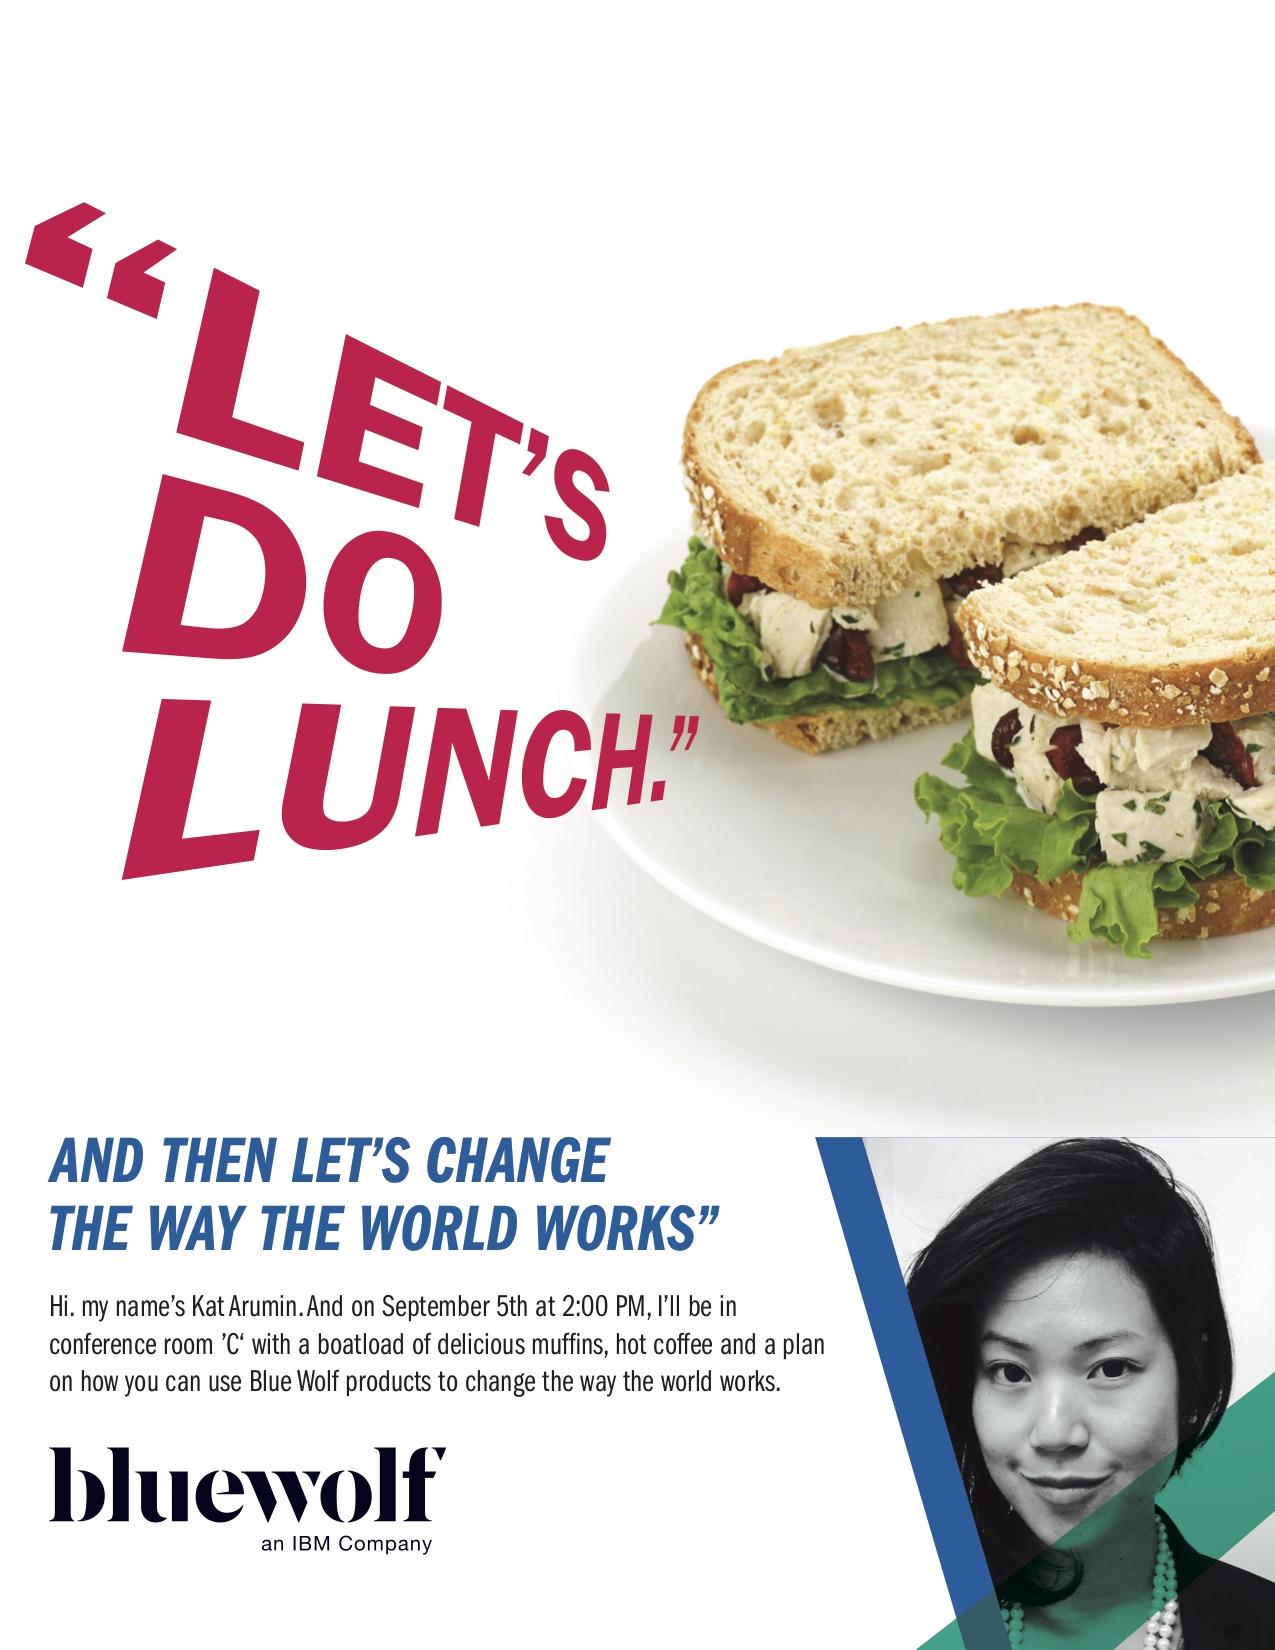 BlueWolf_lunch ad.jpg